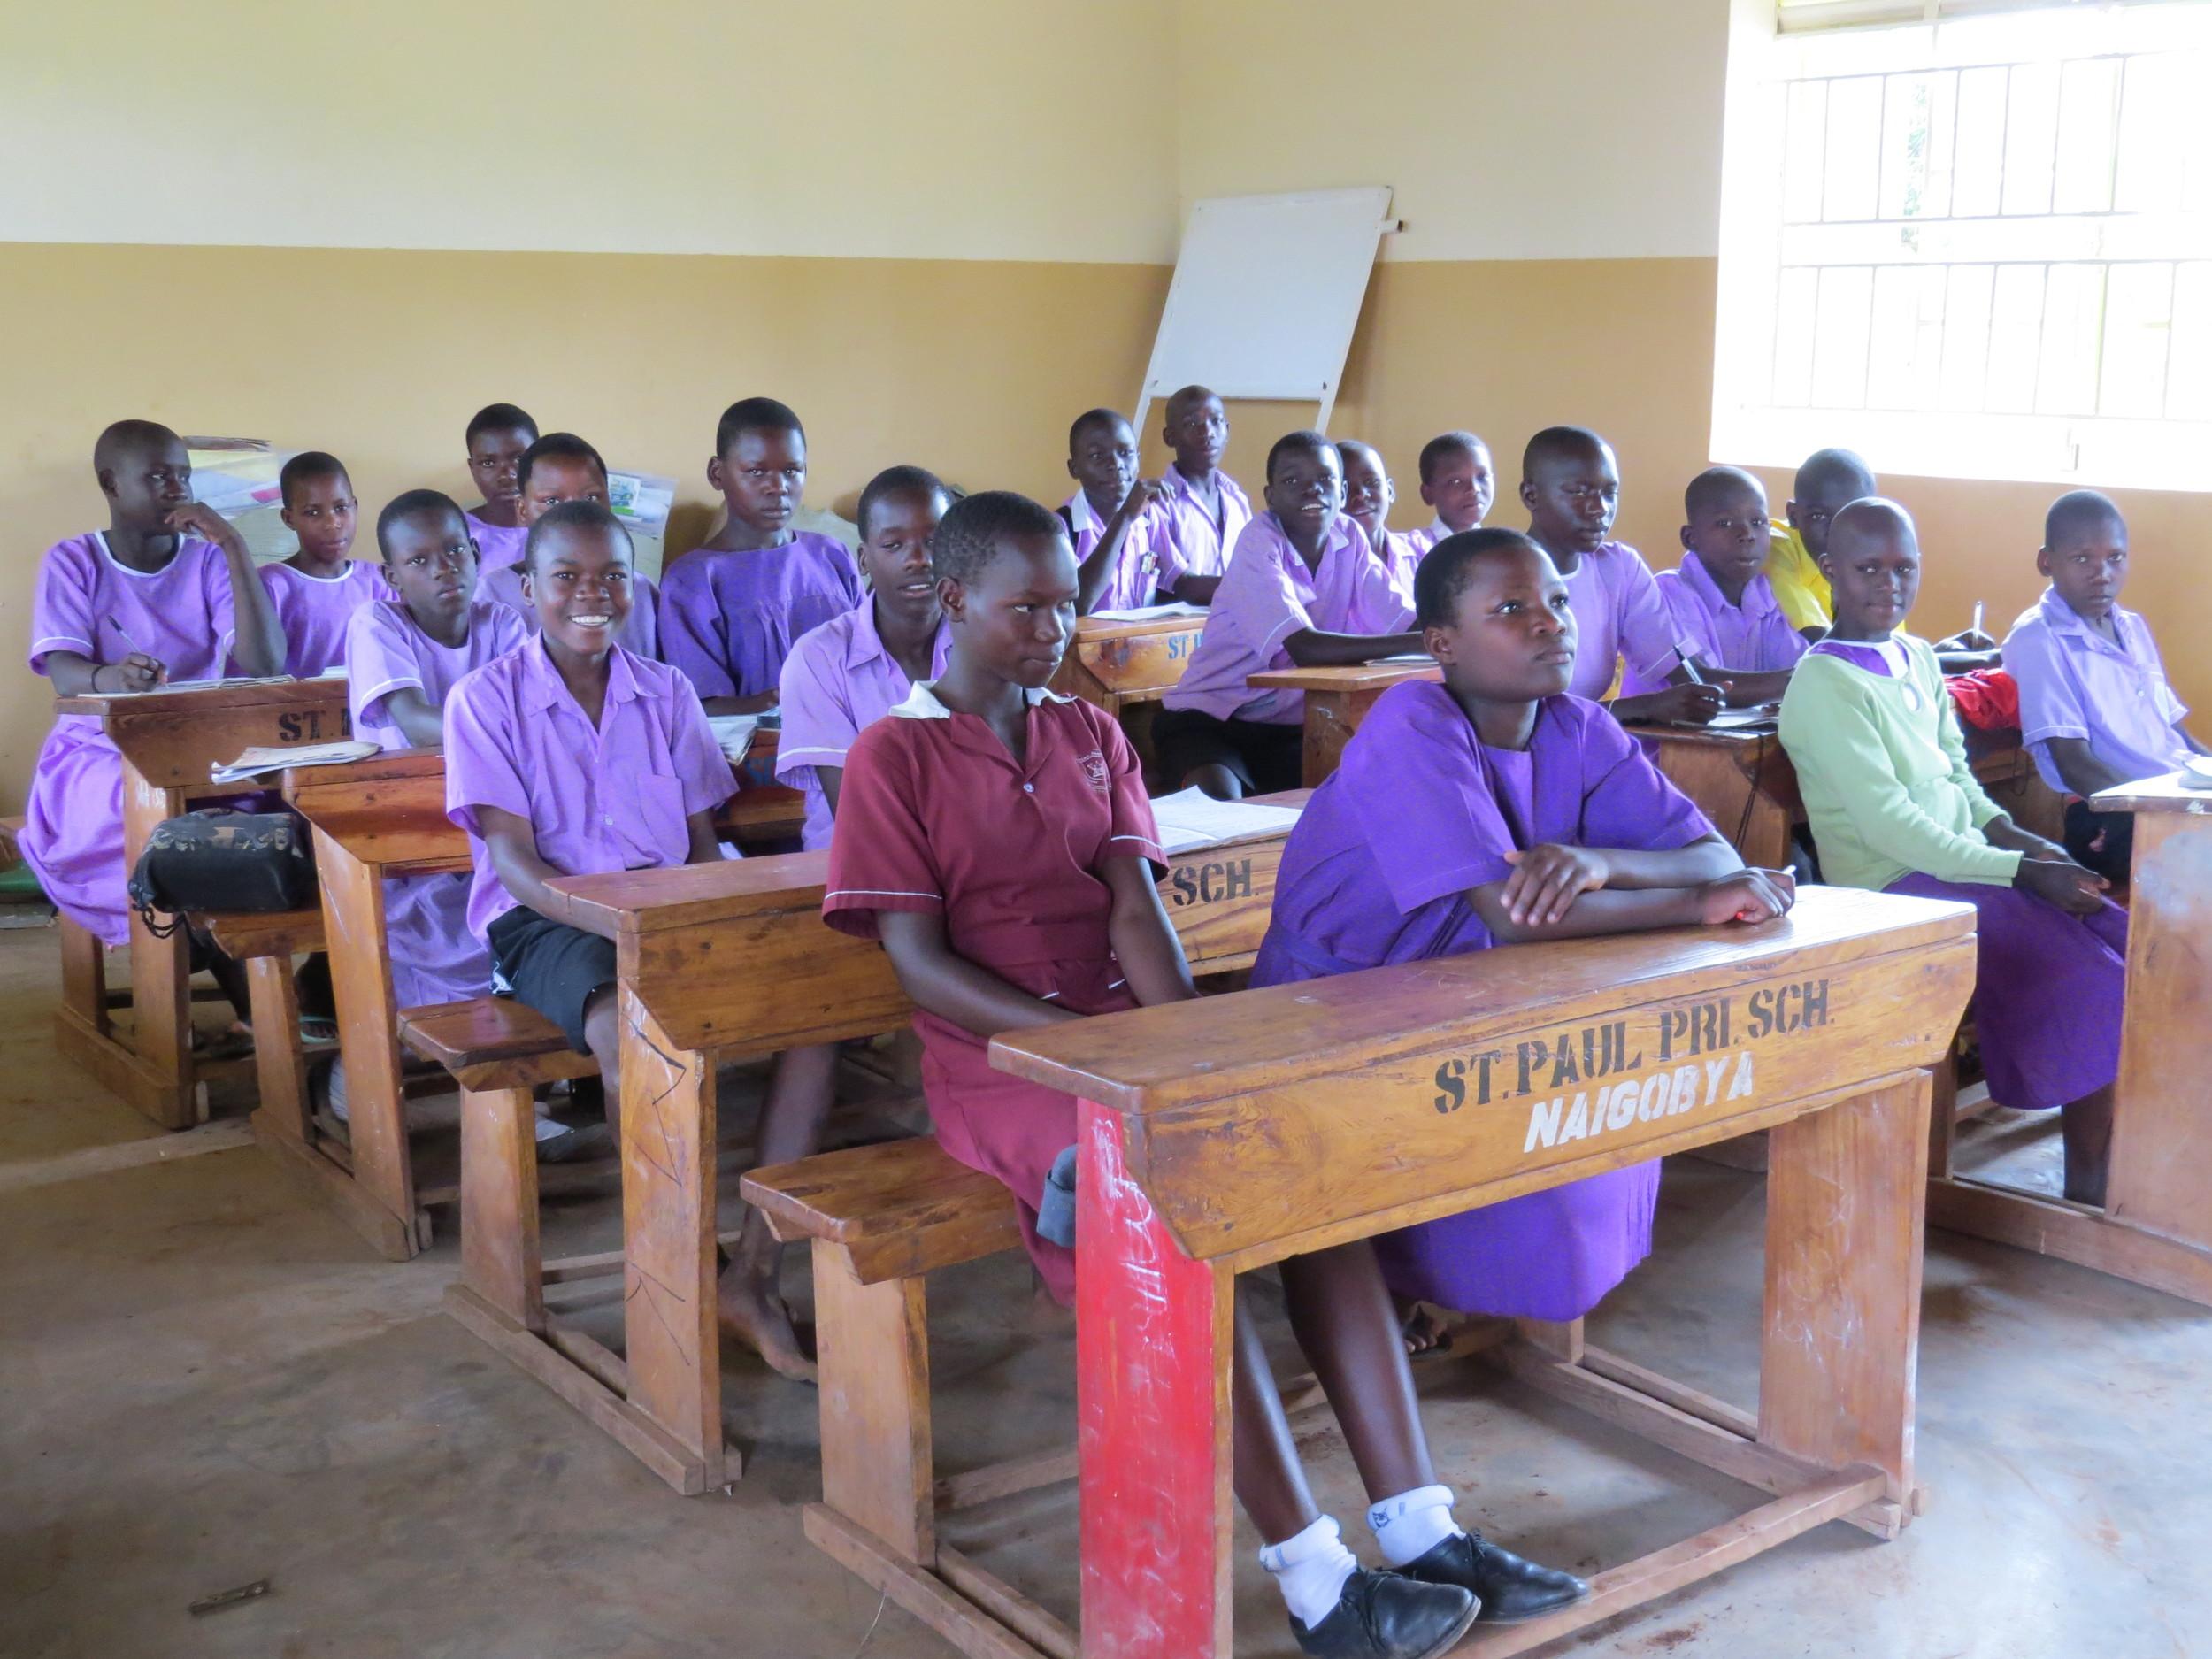 Inside permanent classroom